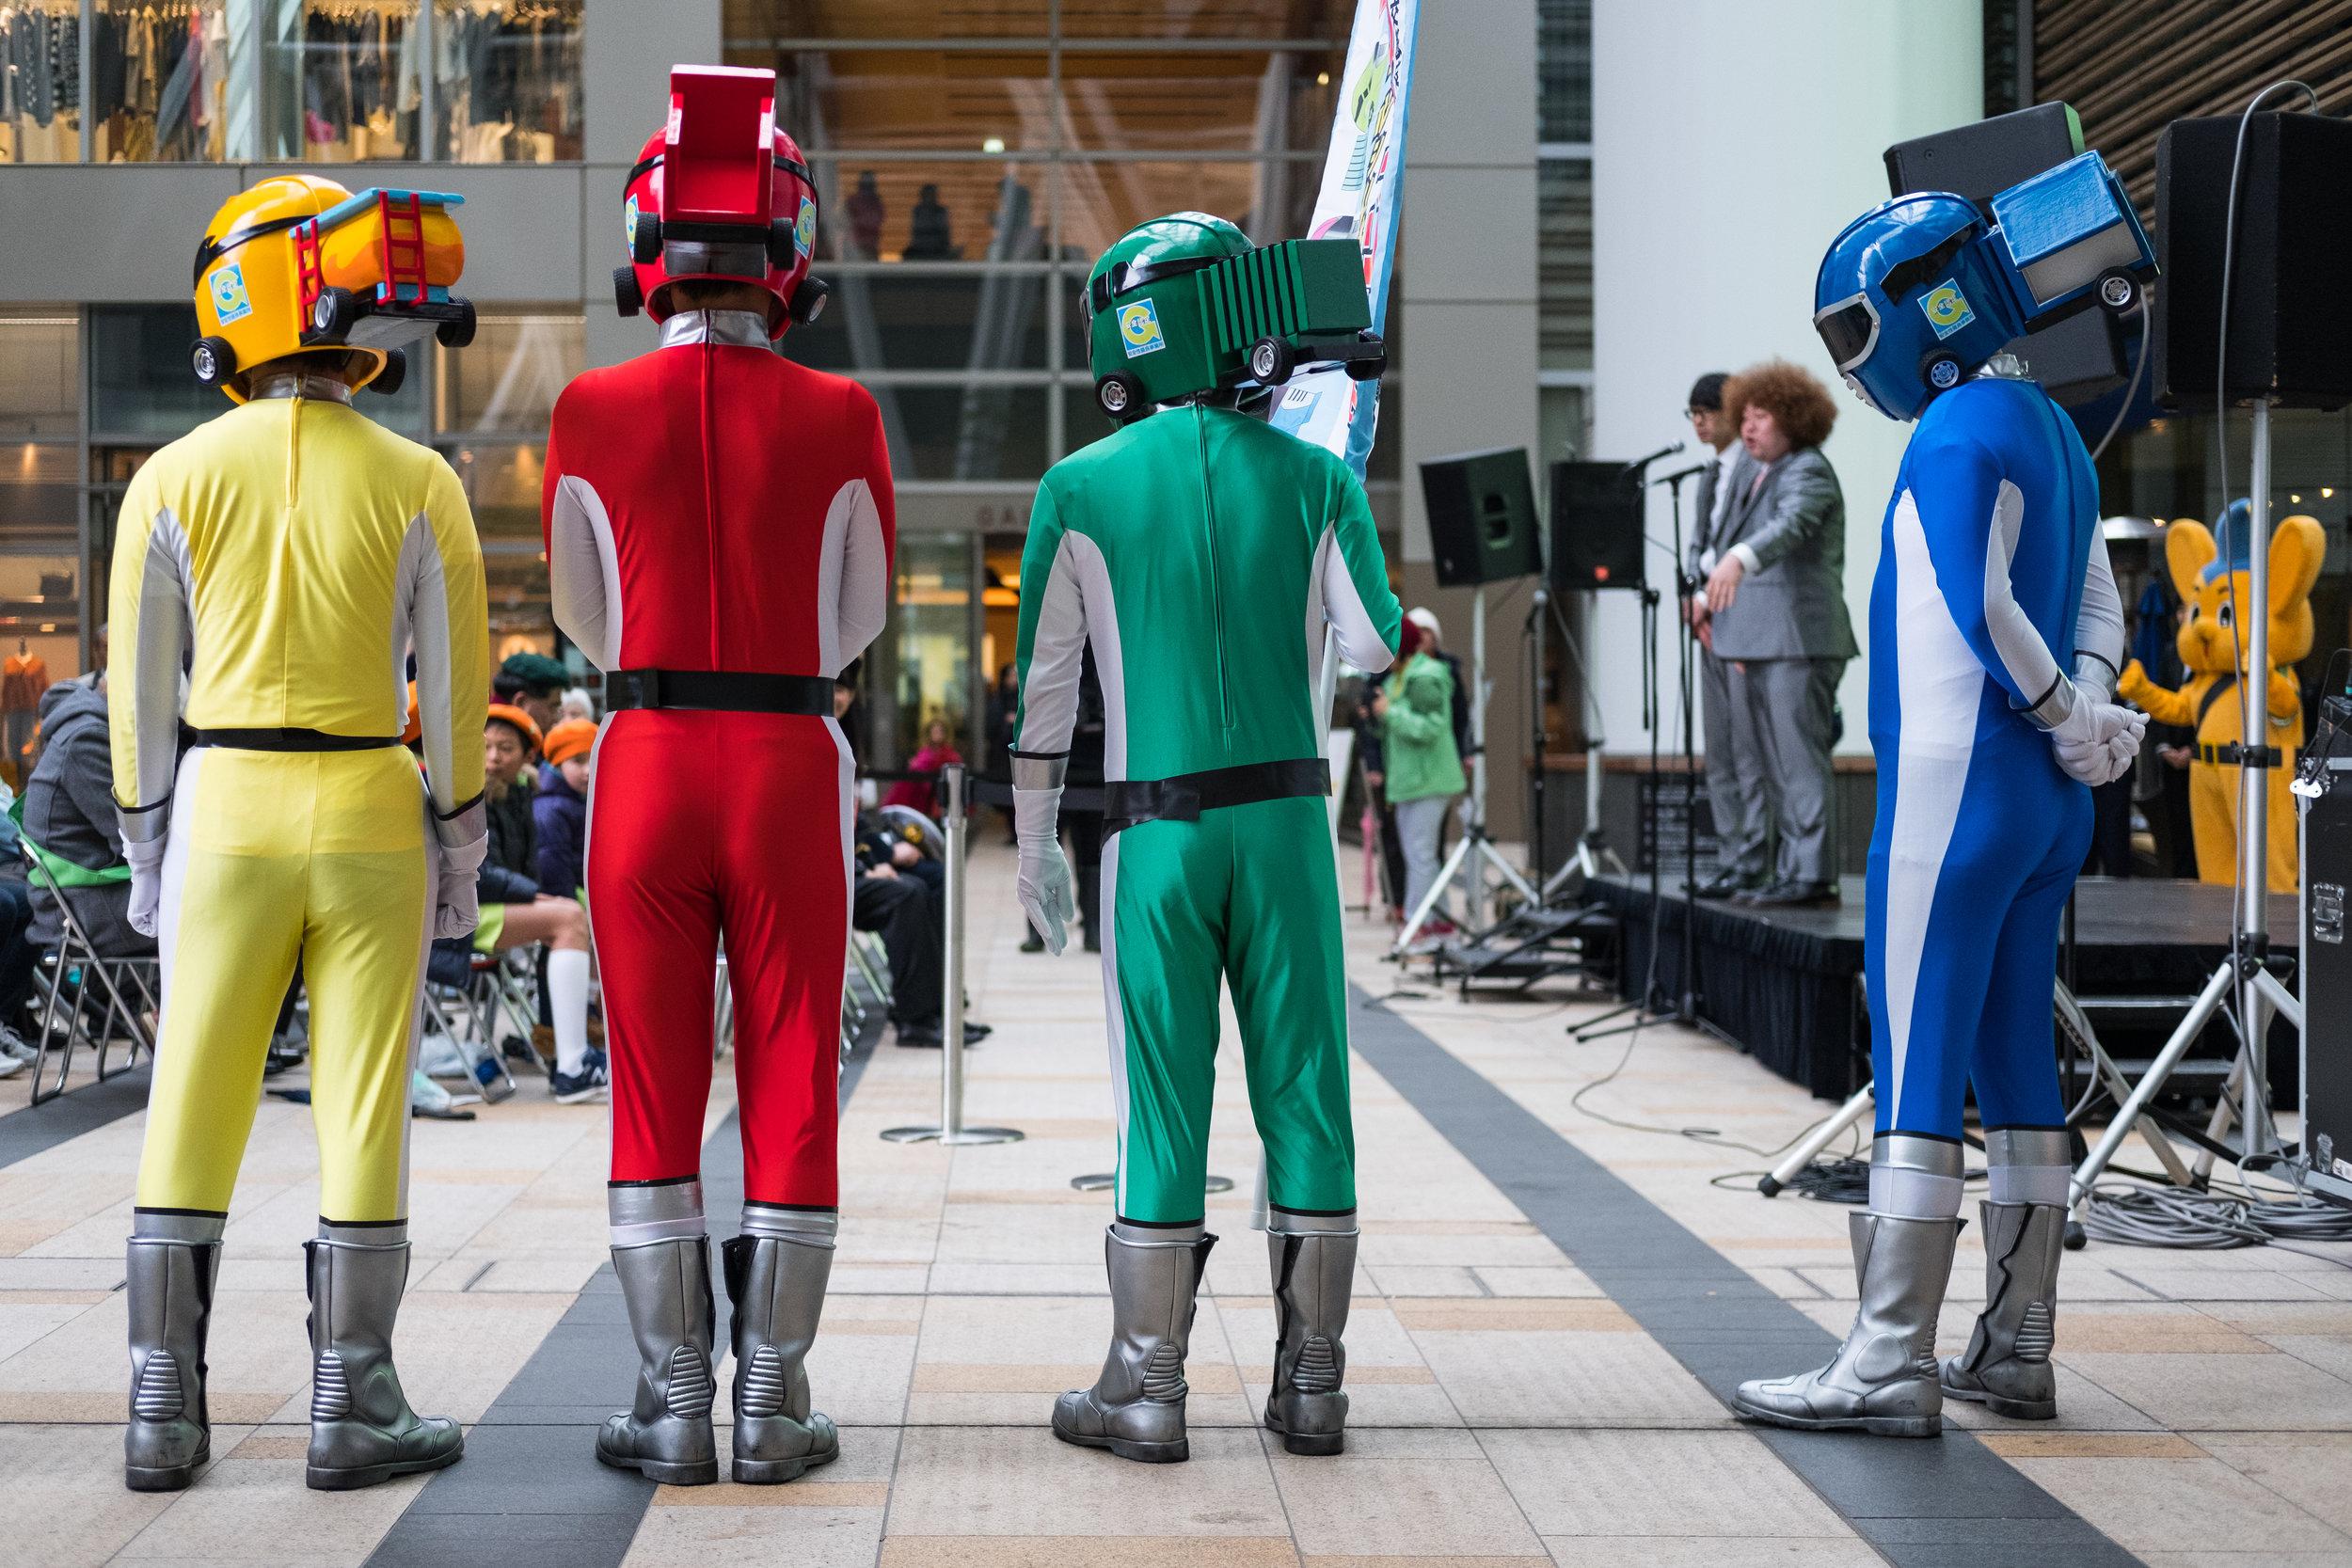 Great colours - strange costumes. Tokyo Midtown